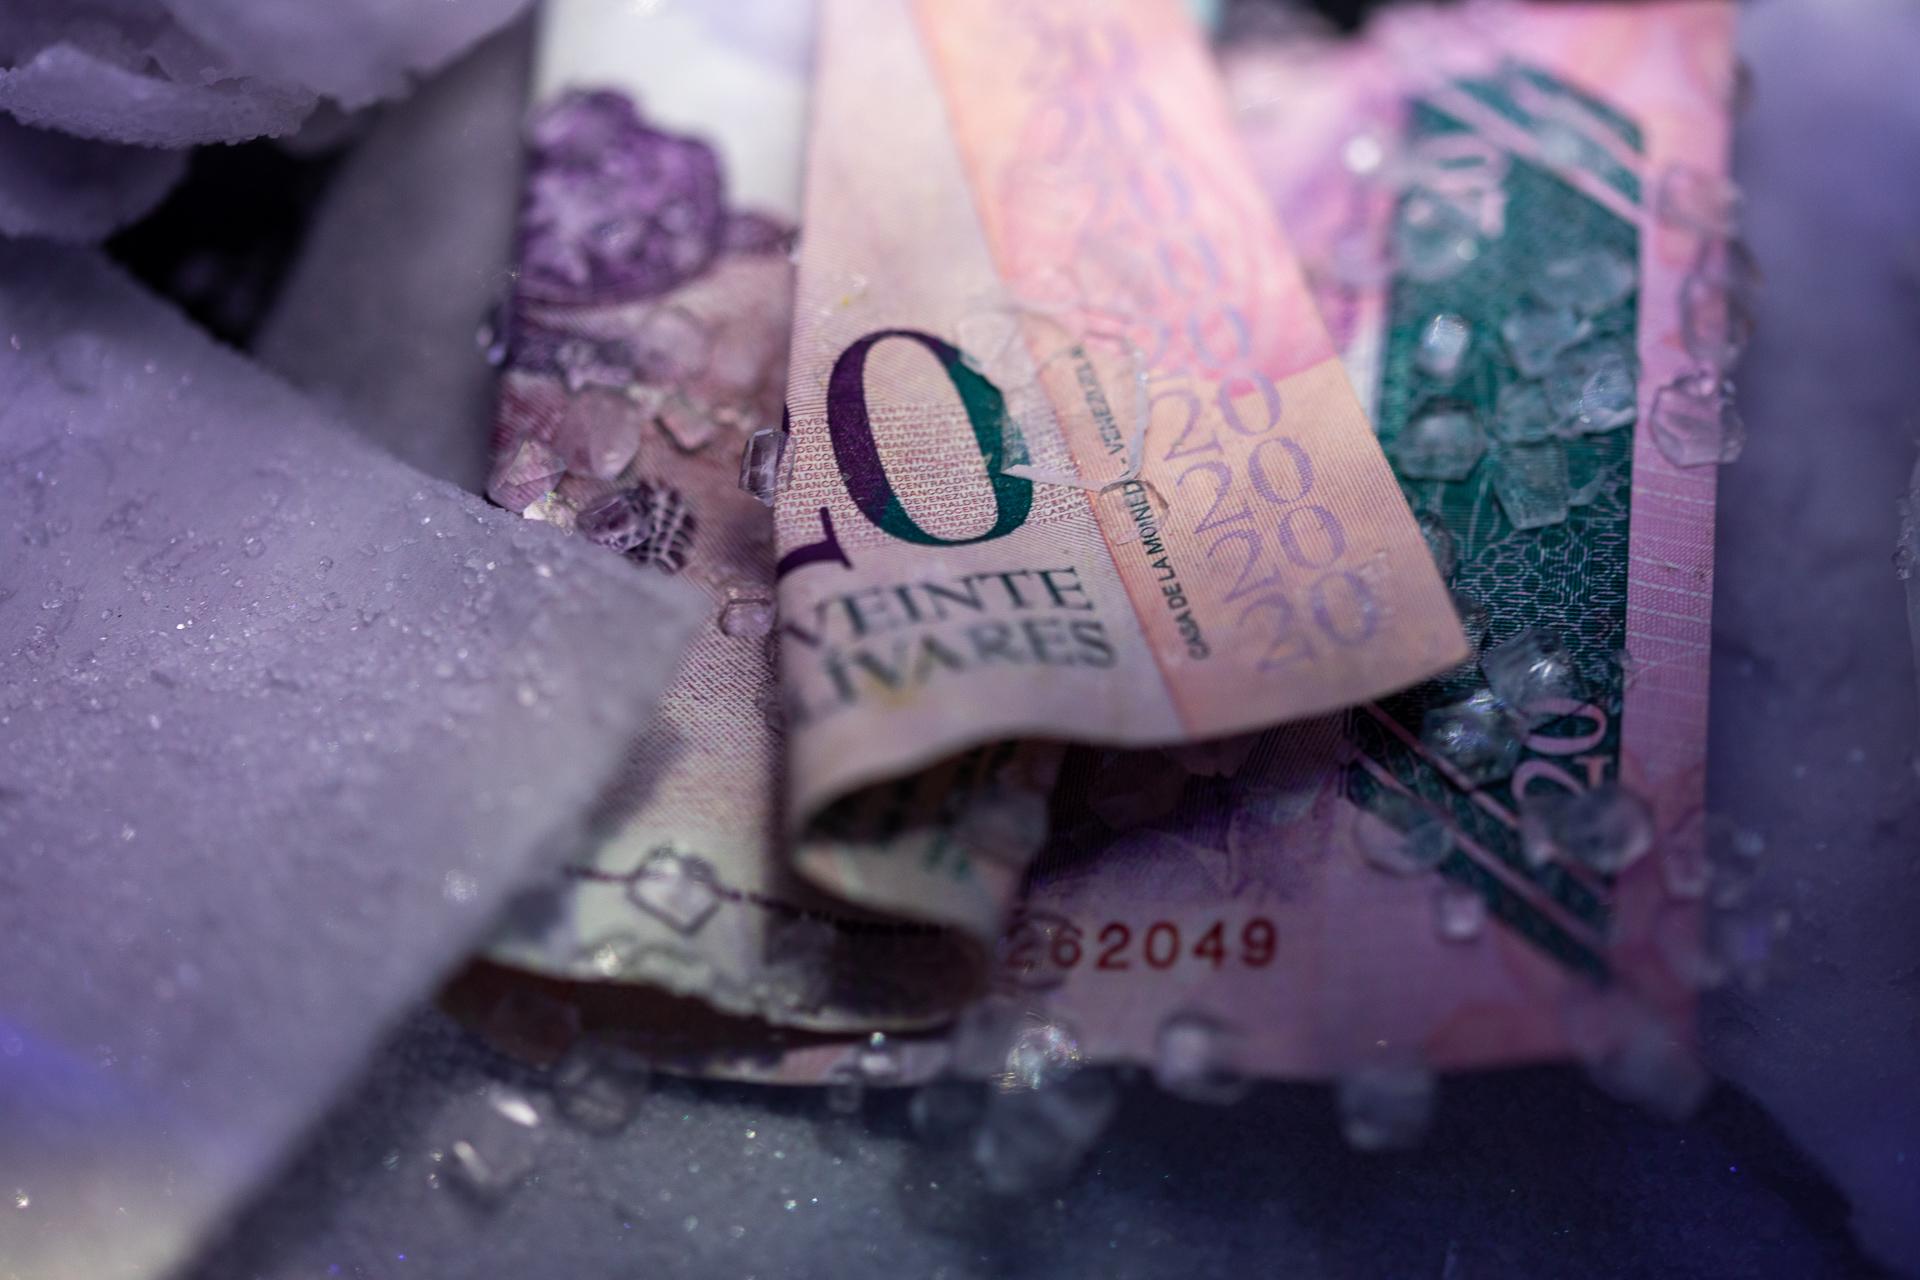 A crystallized Venezuelan bolívar